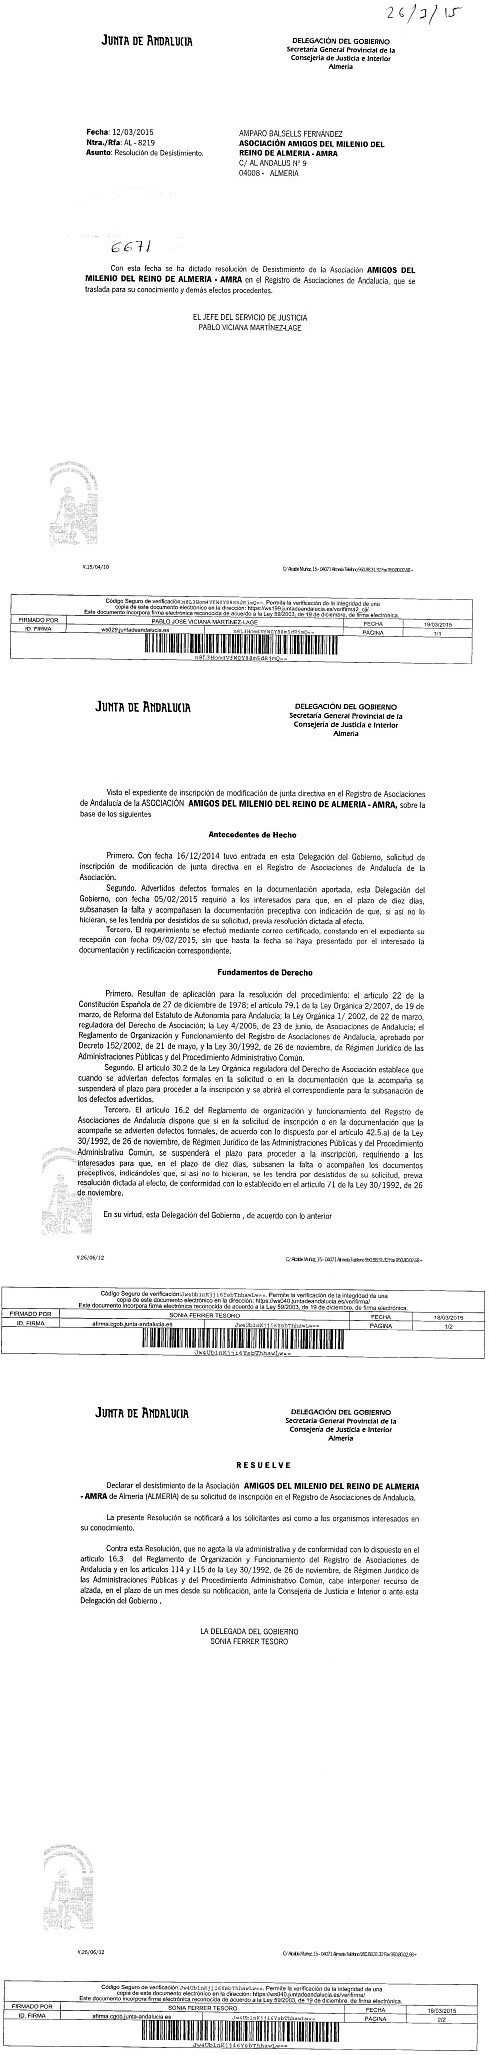 20150409094926-resolucion-sobre-amra-3.jpg